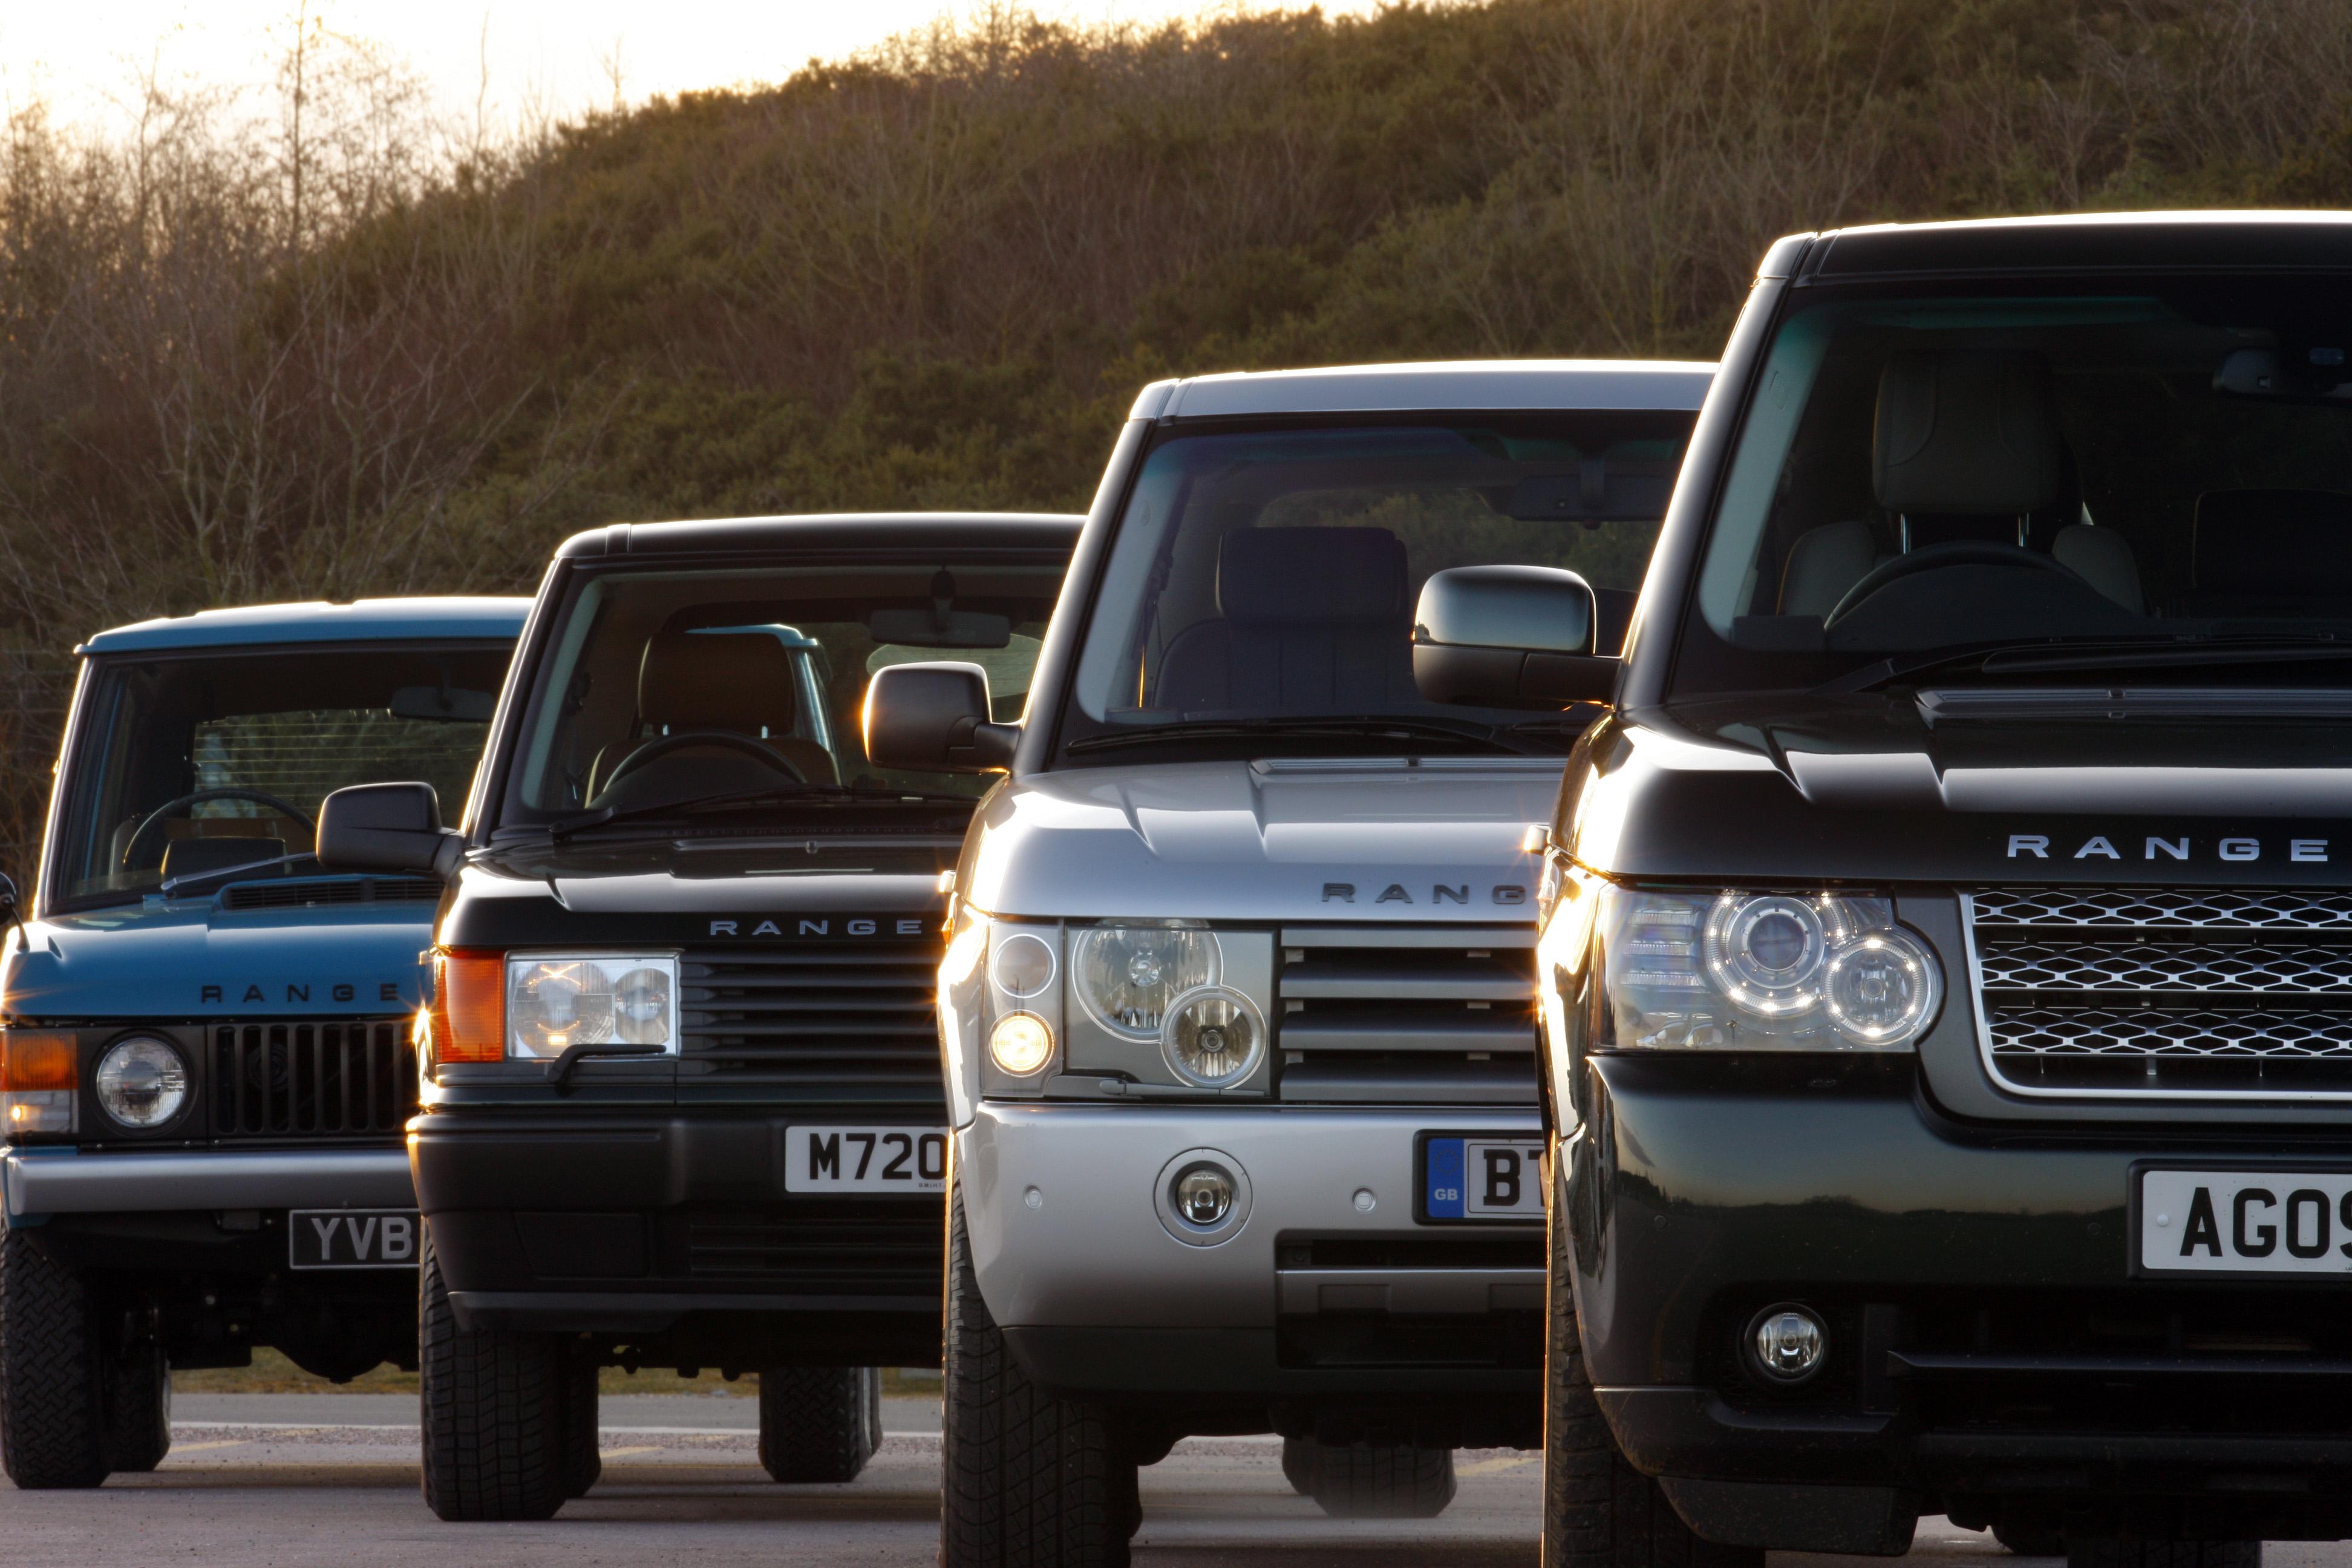 Range Rover Celebrates Its 40th Birthday | Land Rover International Homepage